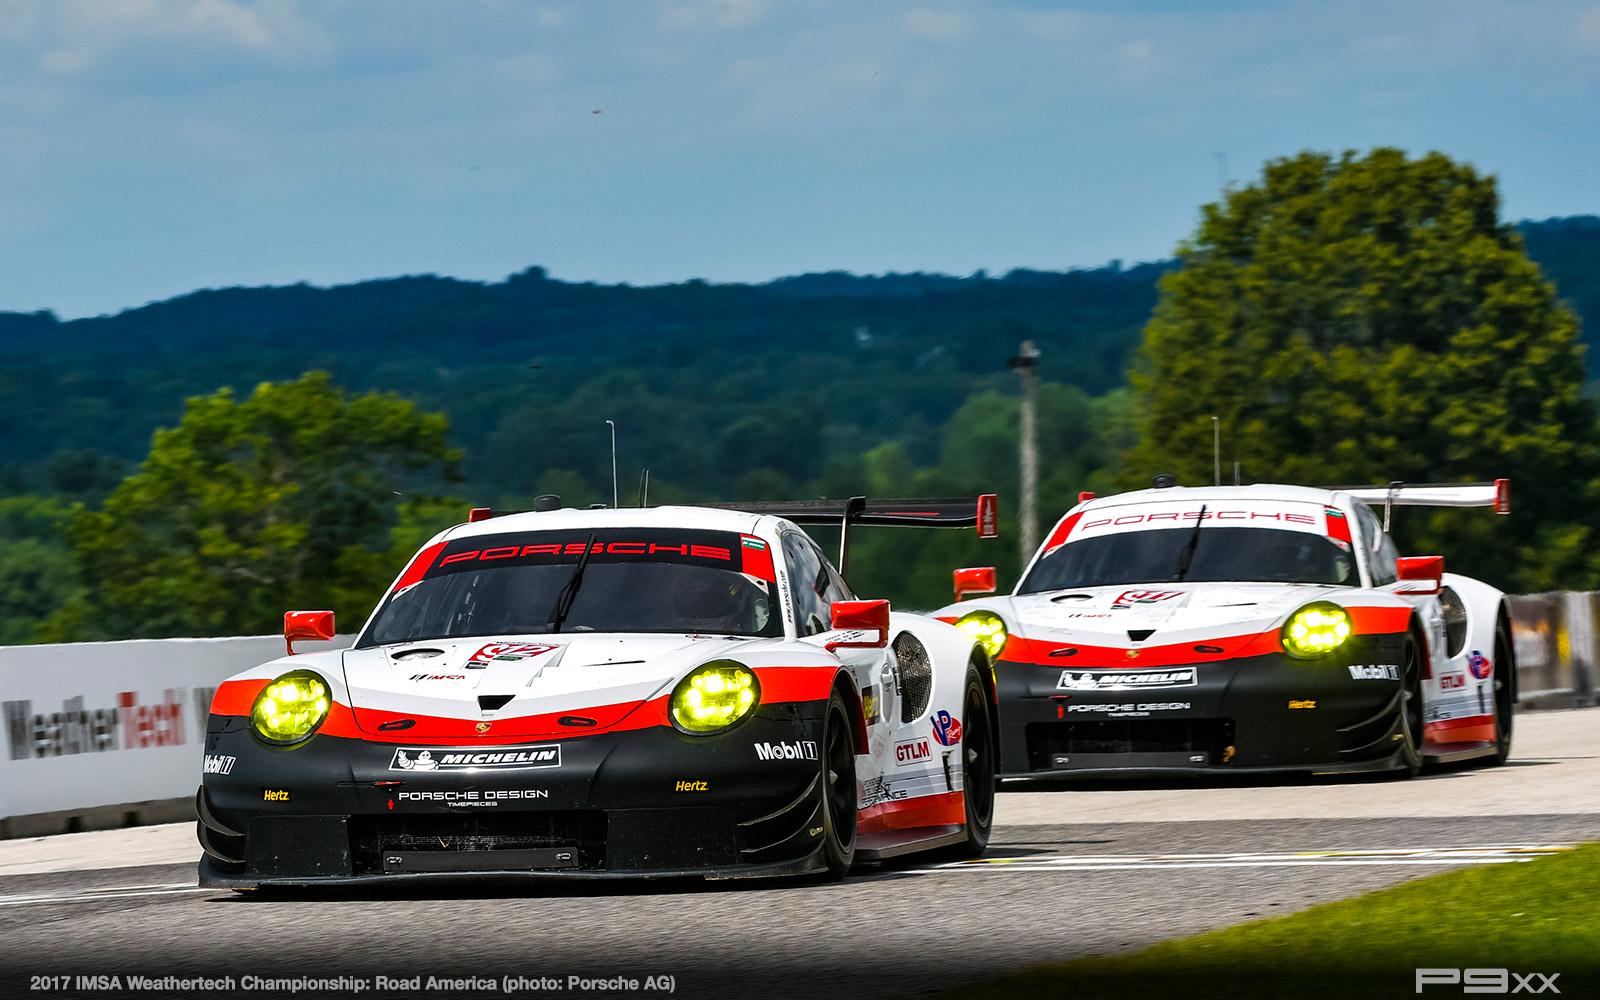 2017-IMSA-Weathertech-Road-America-Porsche-352